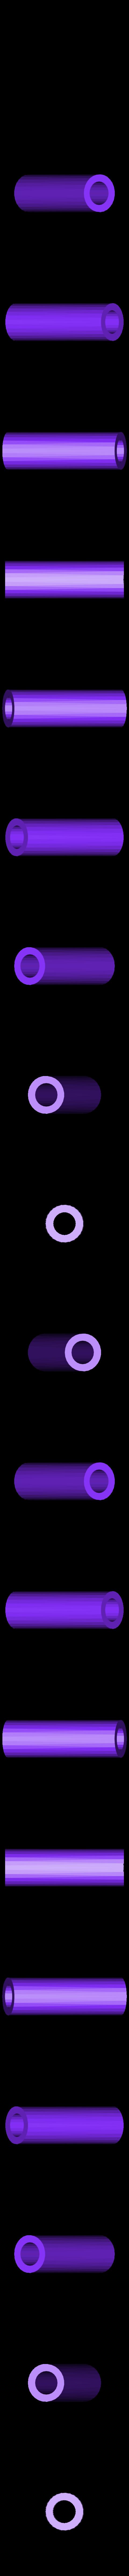 LCD_Holder_2_-_cylinder.stl Télécharger fichier STL gratuit Contrôleur LCD graphique intelligent - Prusa i3 Hephestos - Support • Objet imprimable en 3D, Rusichar